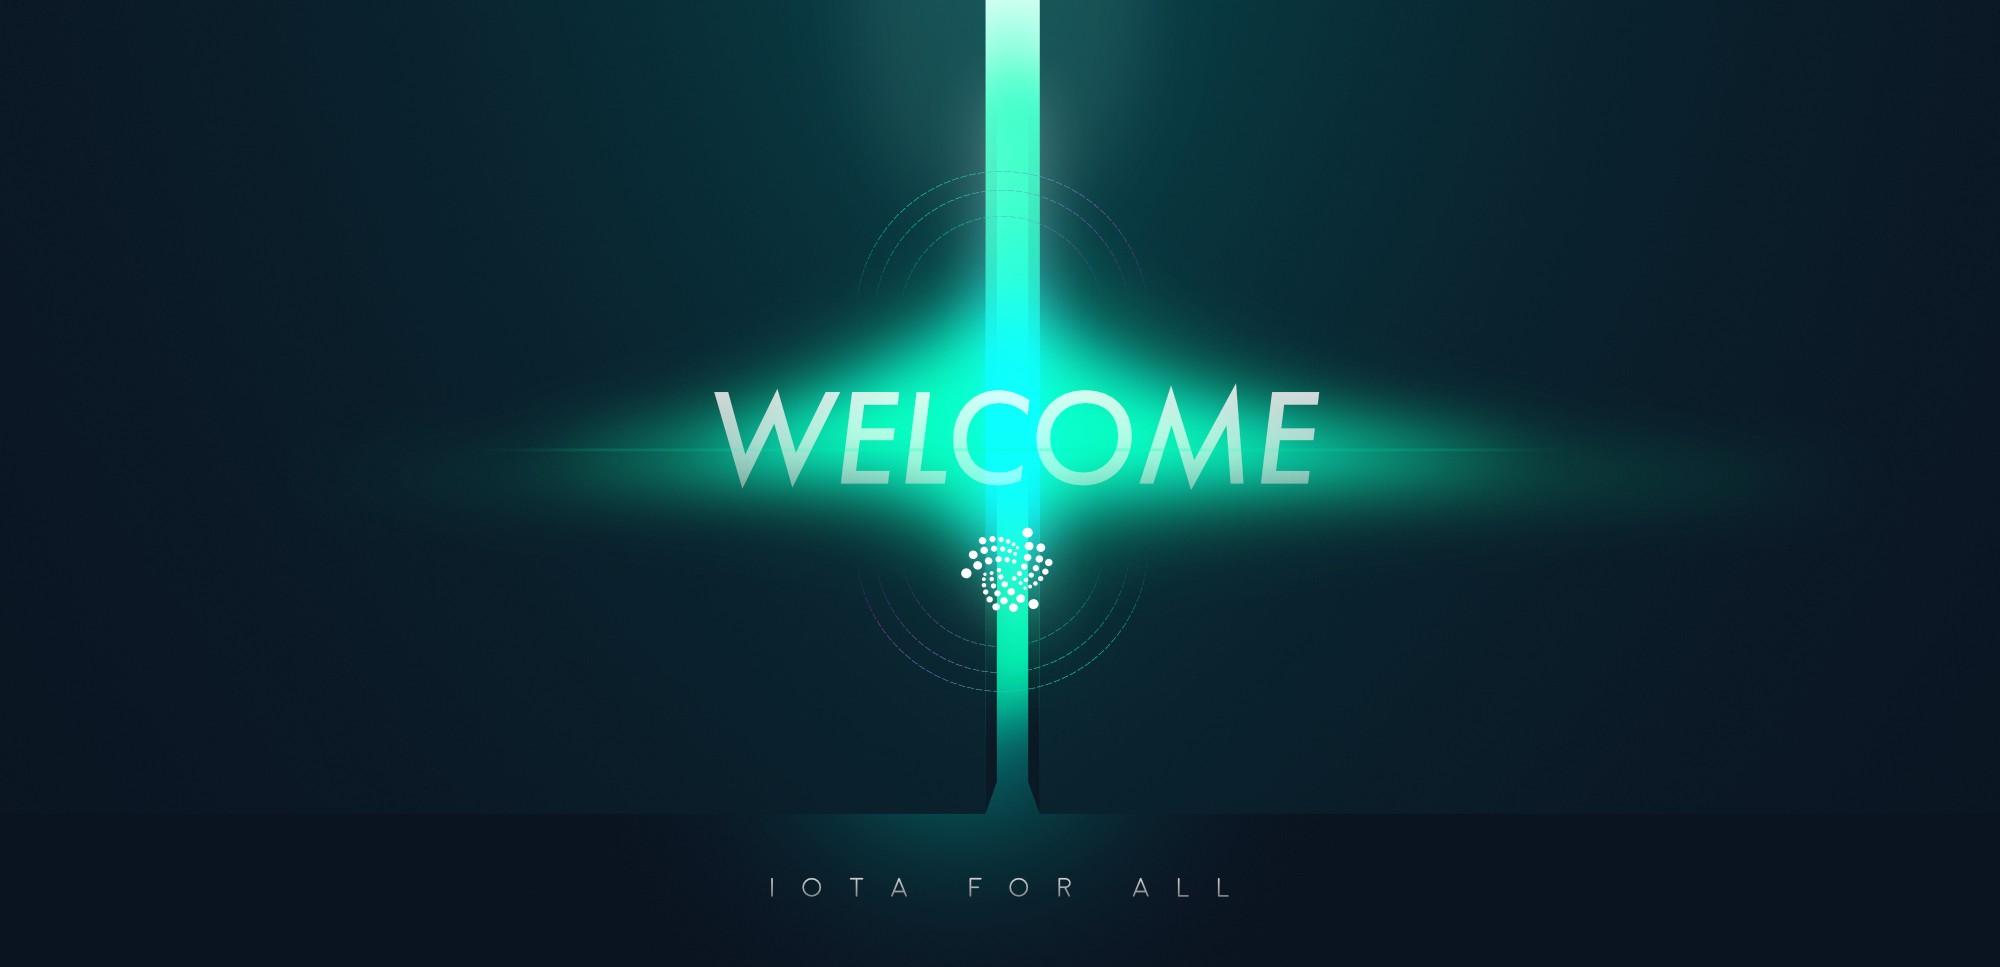 iota, blockchain, tokens, altcoins, criptomonedas